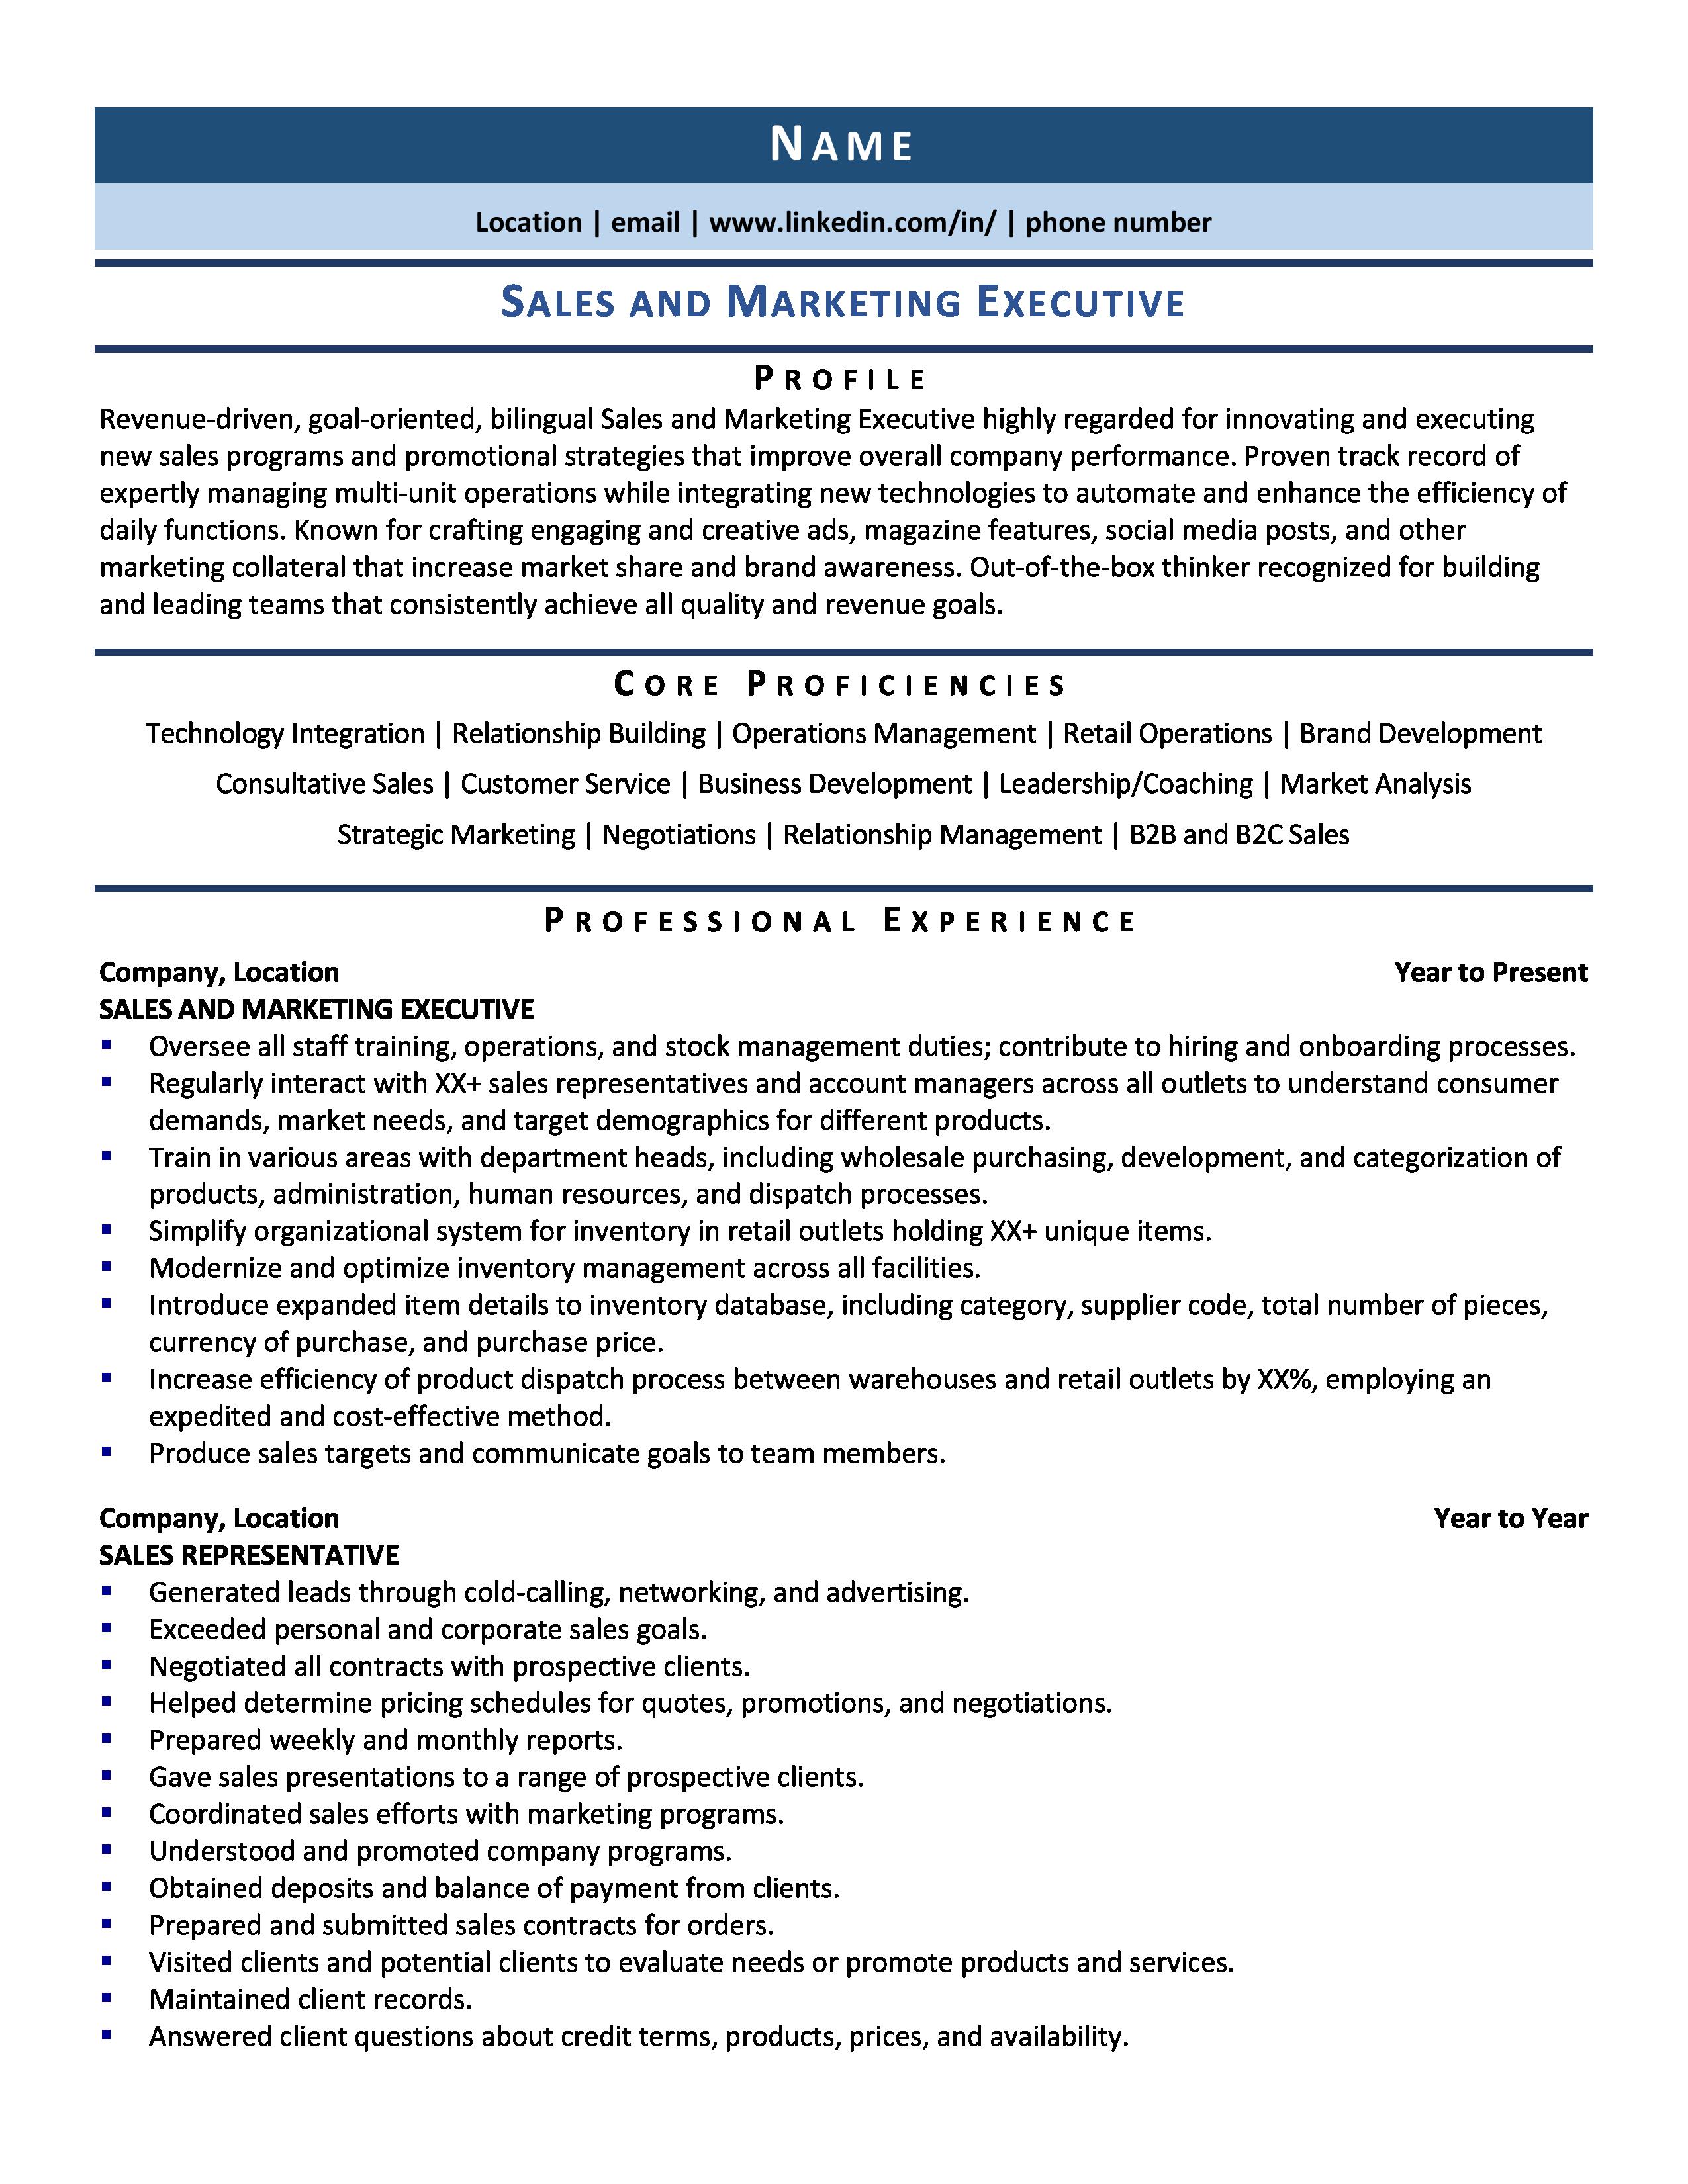 Sales Marketing Executive Resume Sample Guide 2020 Resume Examples For 2020 Sales Marketing Executive Resume Example Guide 2020 Sales Marketin